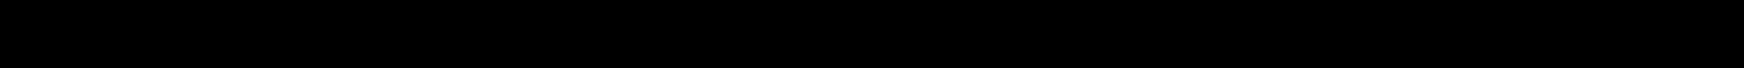 MatrixScriptOTGR-Inline.otf